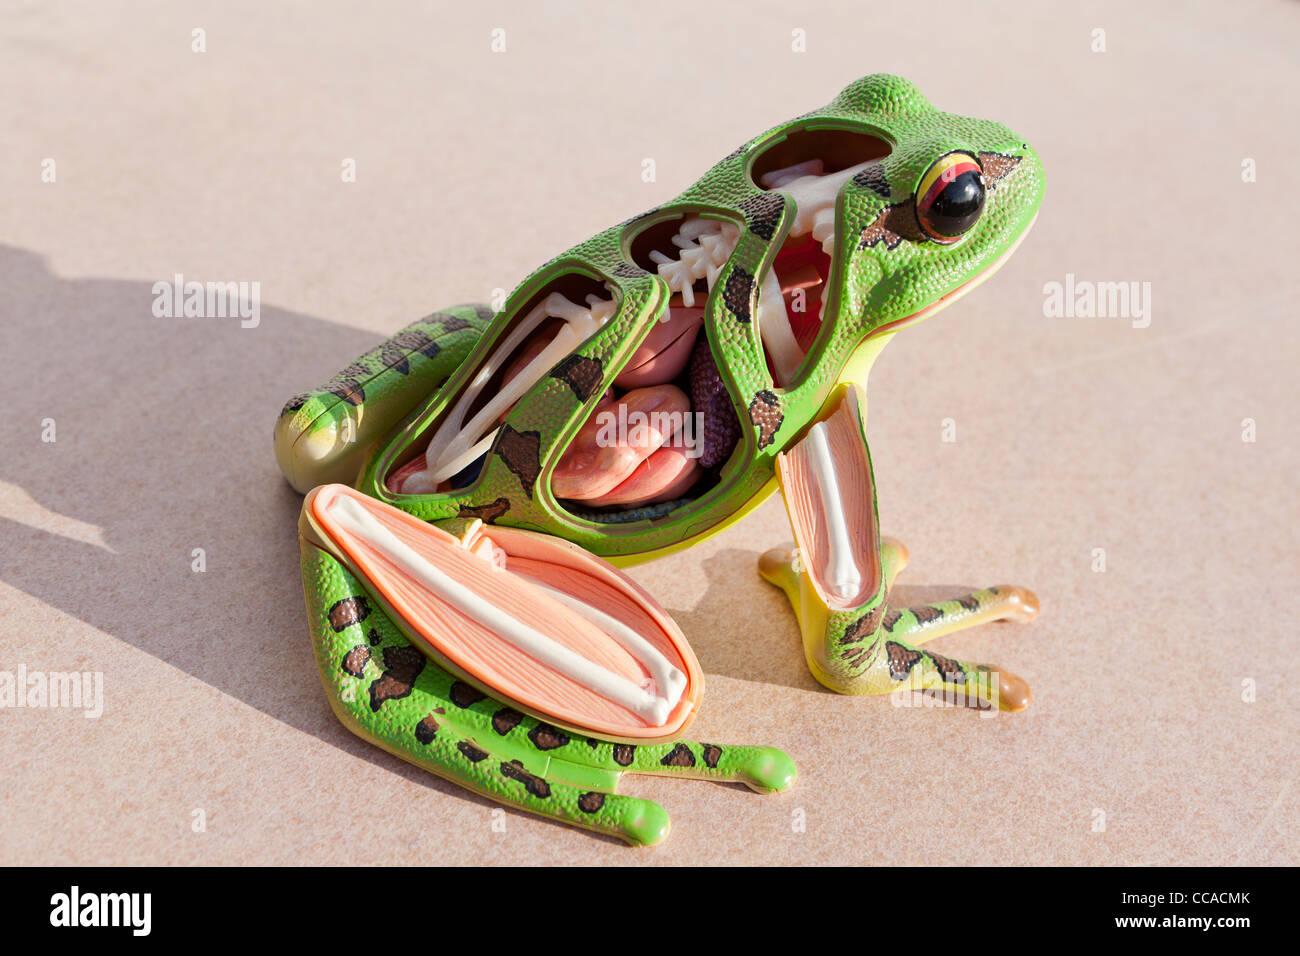 Modelo de anatomía de rana Foto & Imagen De Stock: 42026115 - Alamy